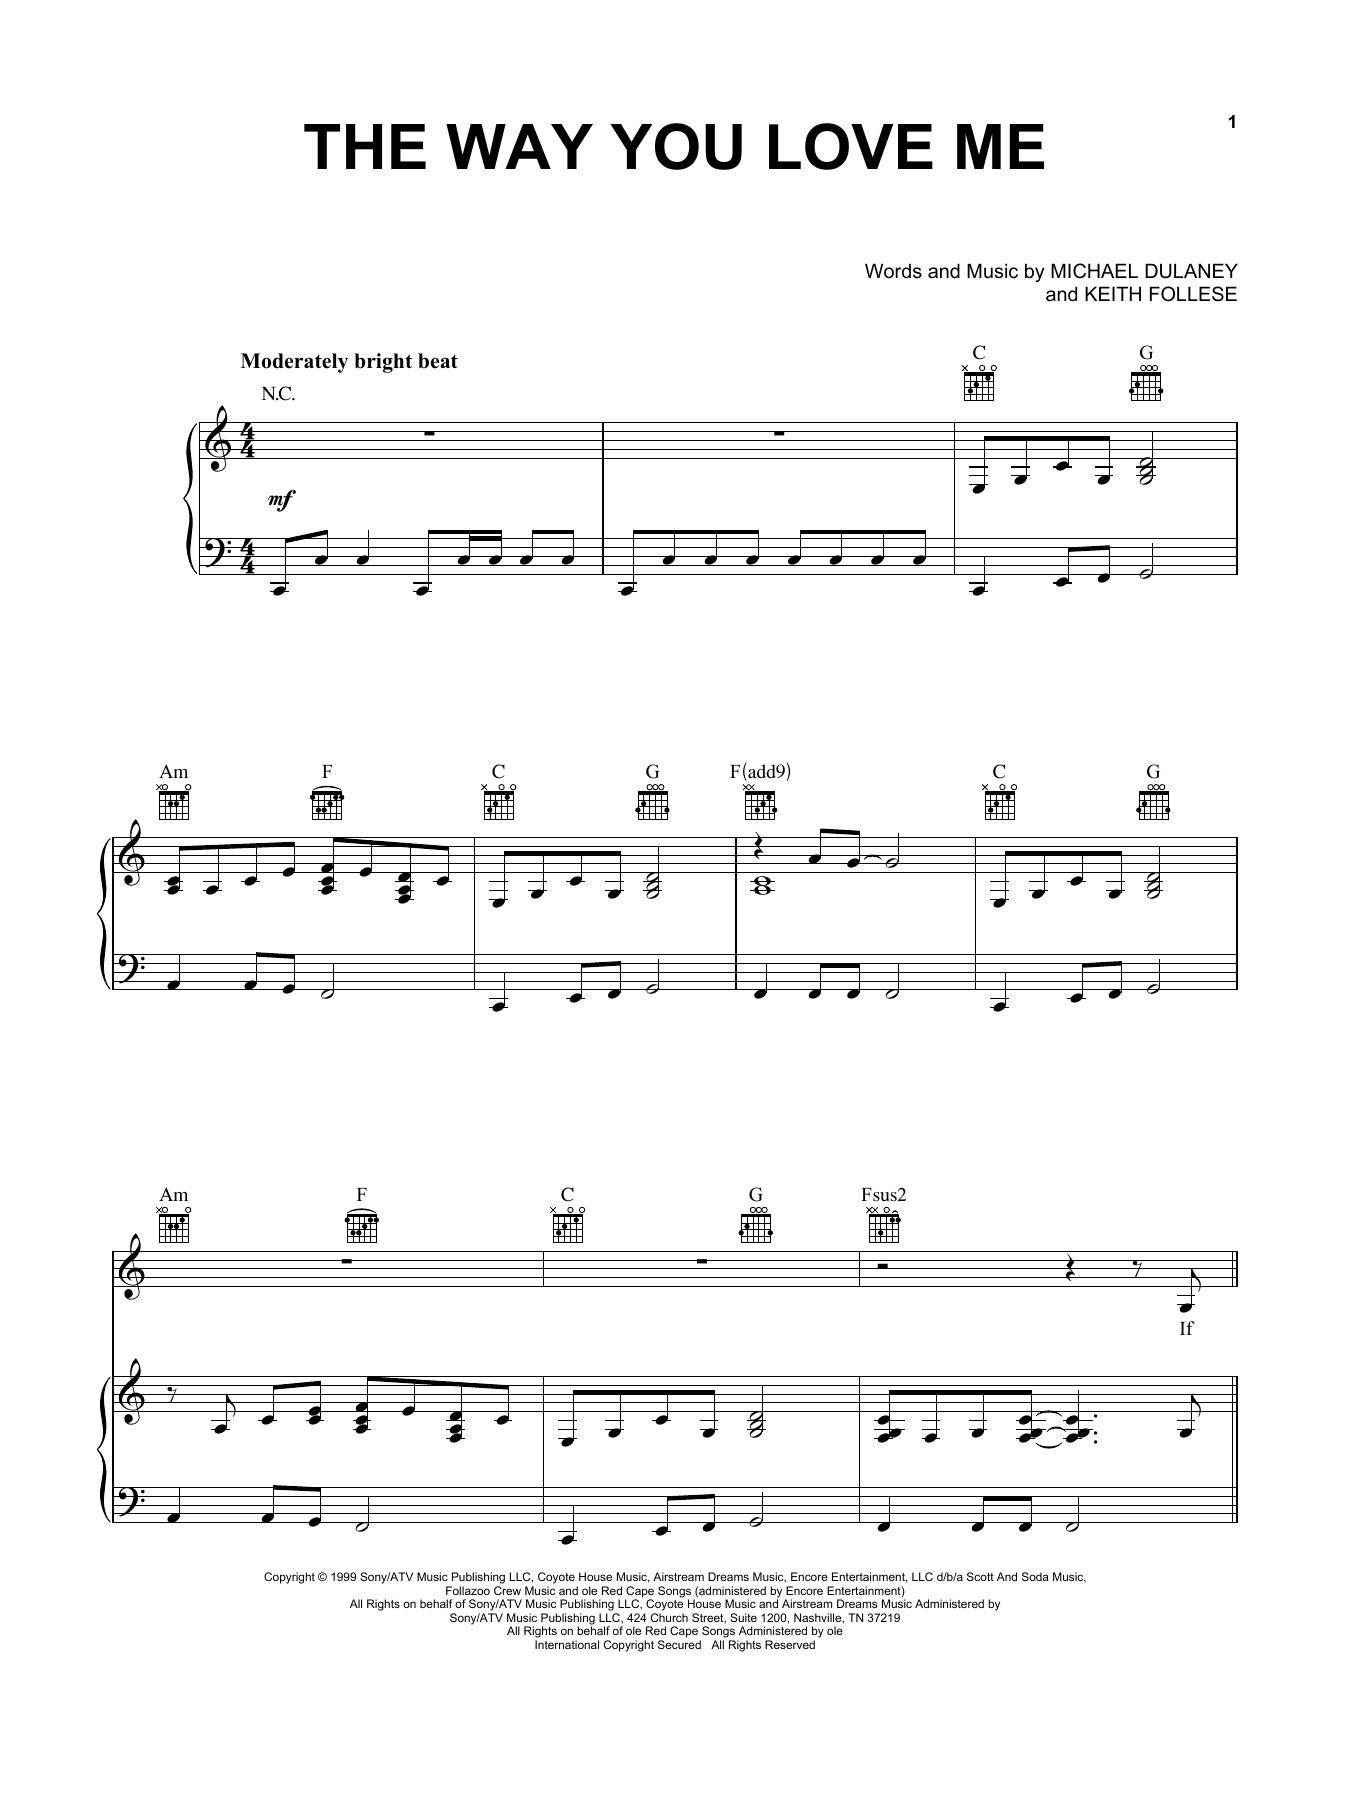 The Way You Love Me sheet music